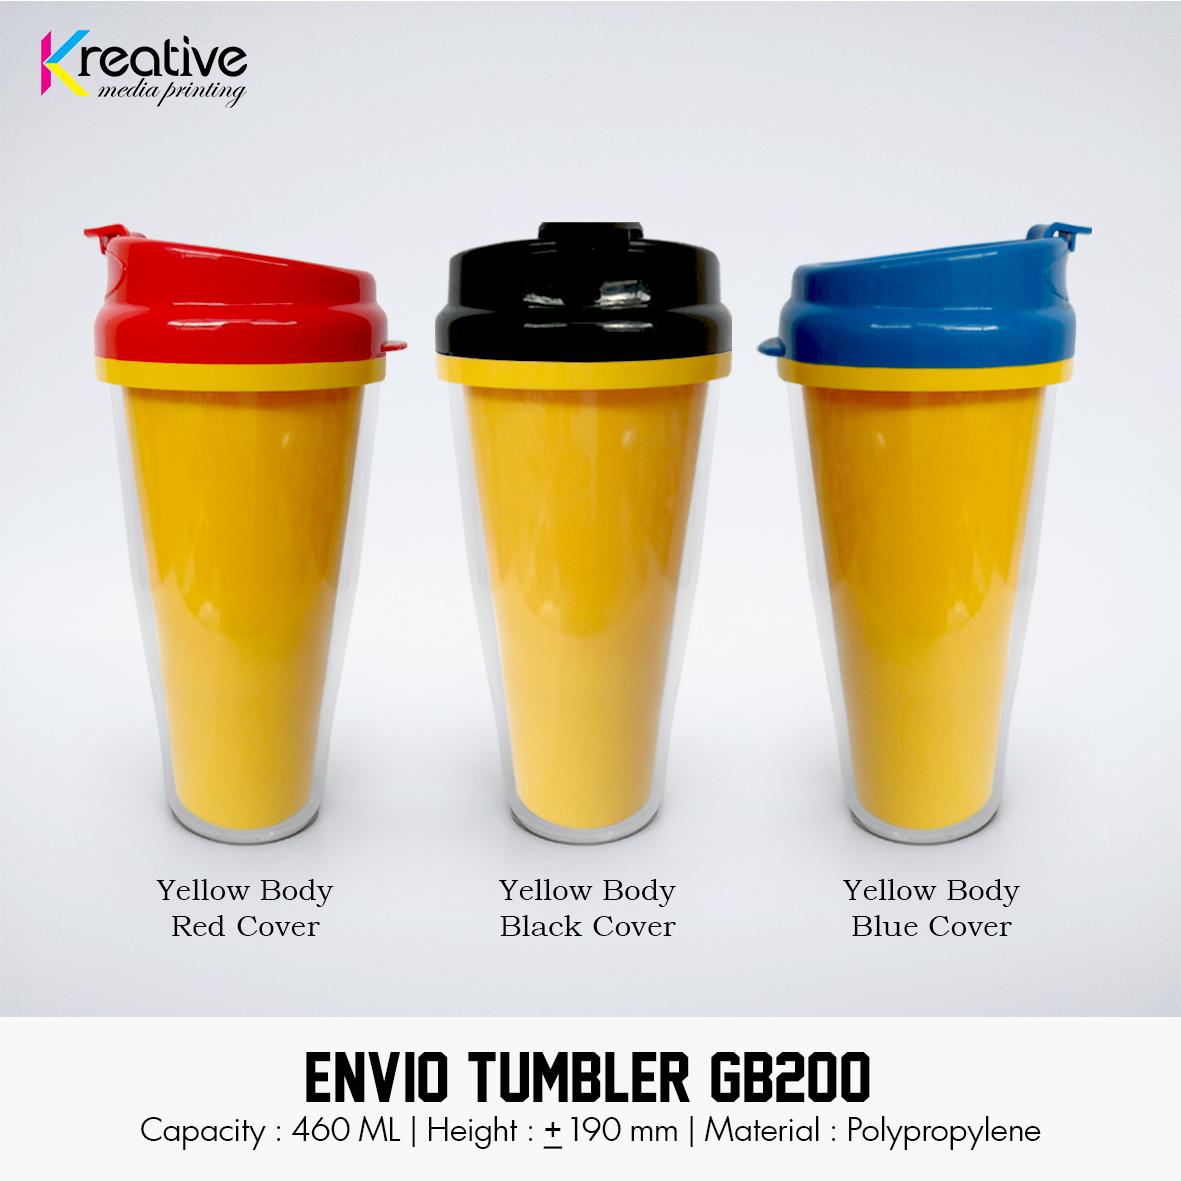 Envio Tumbler  GB200 Technoplast (3)